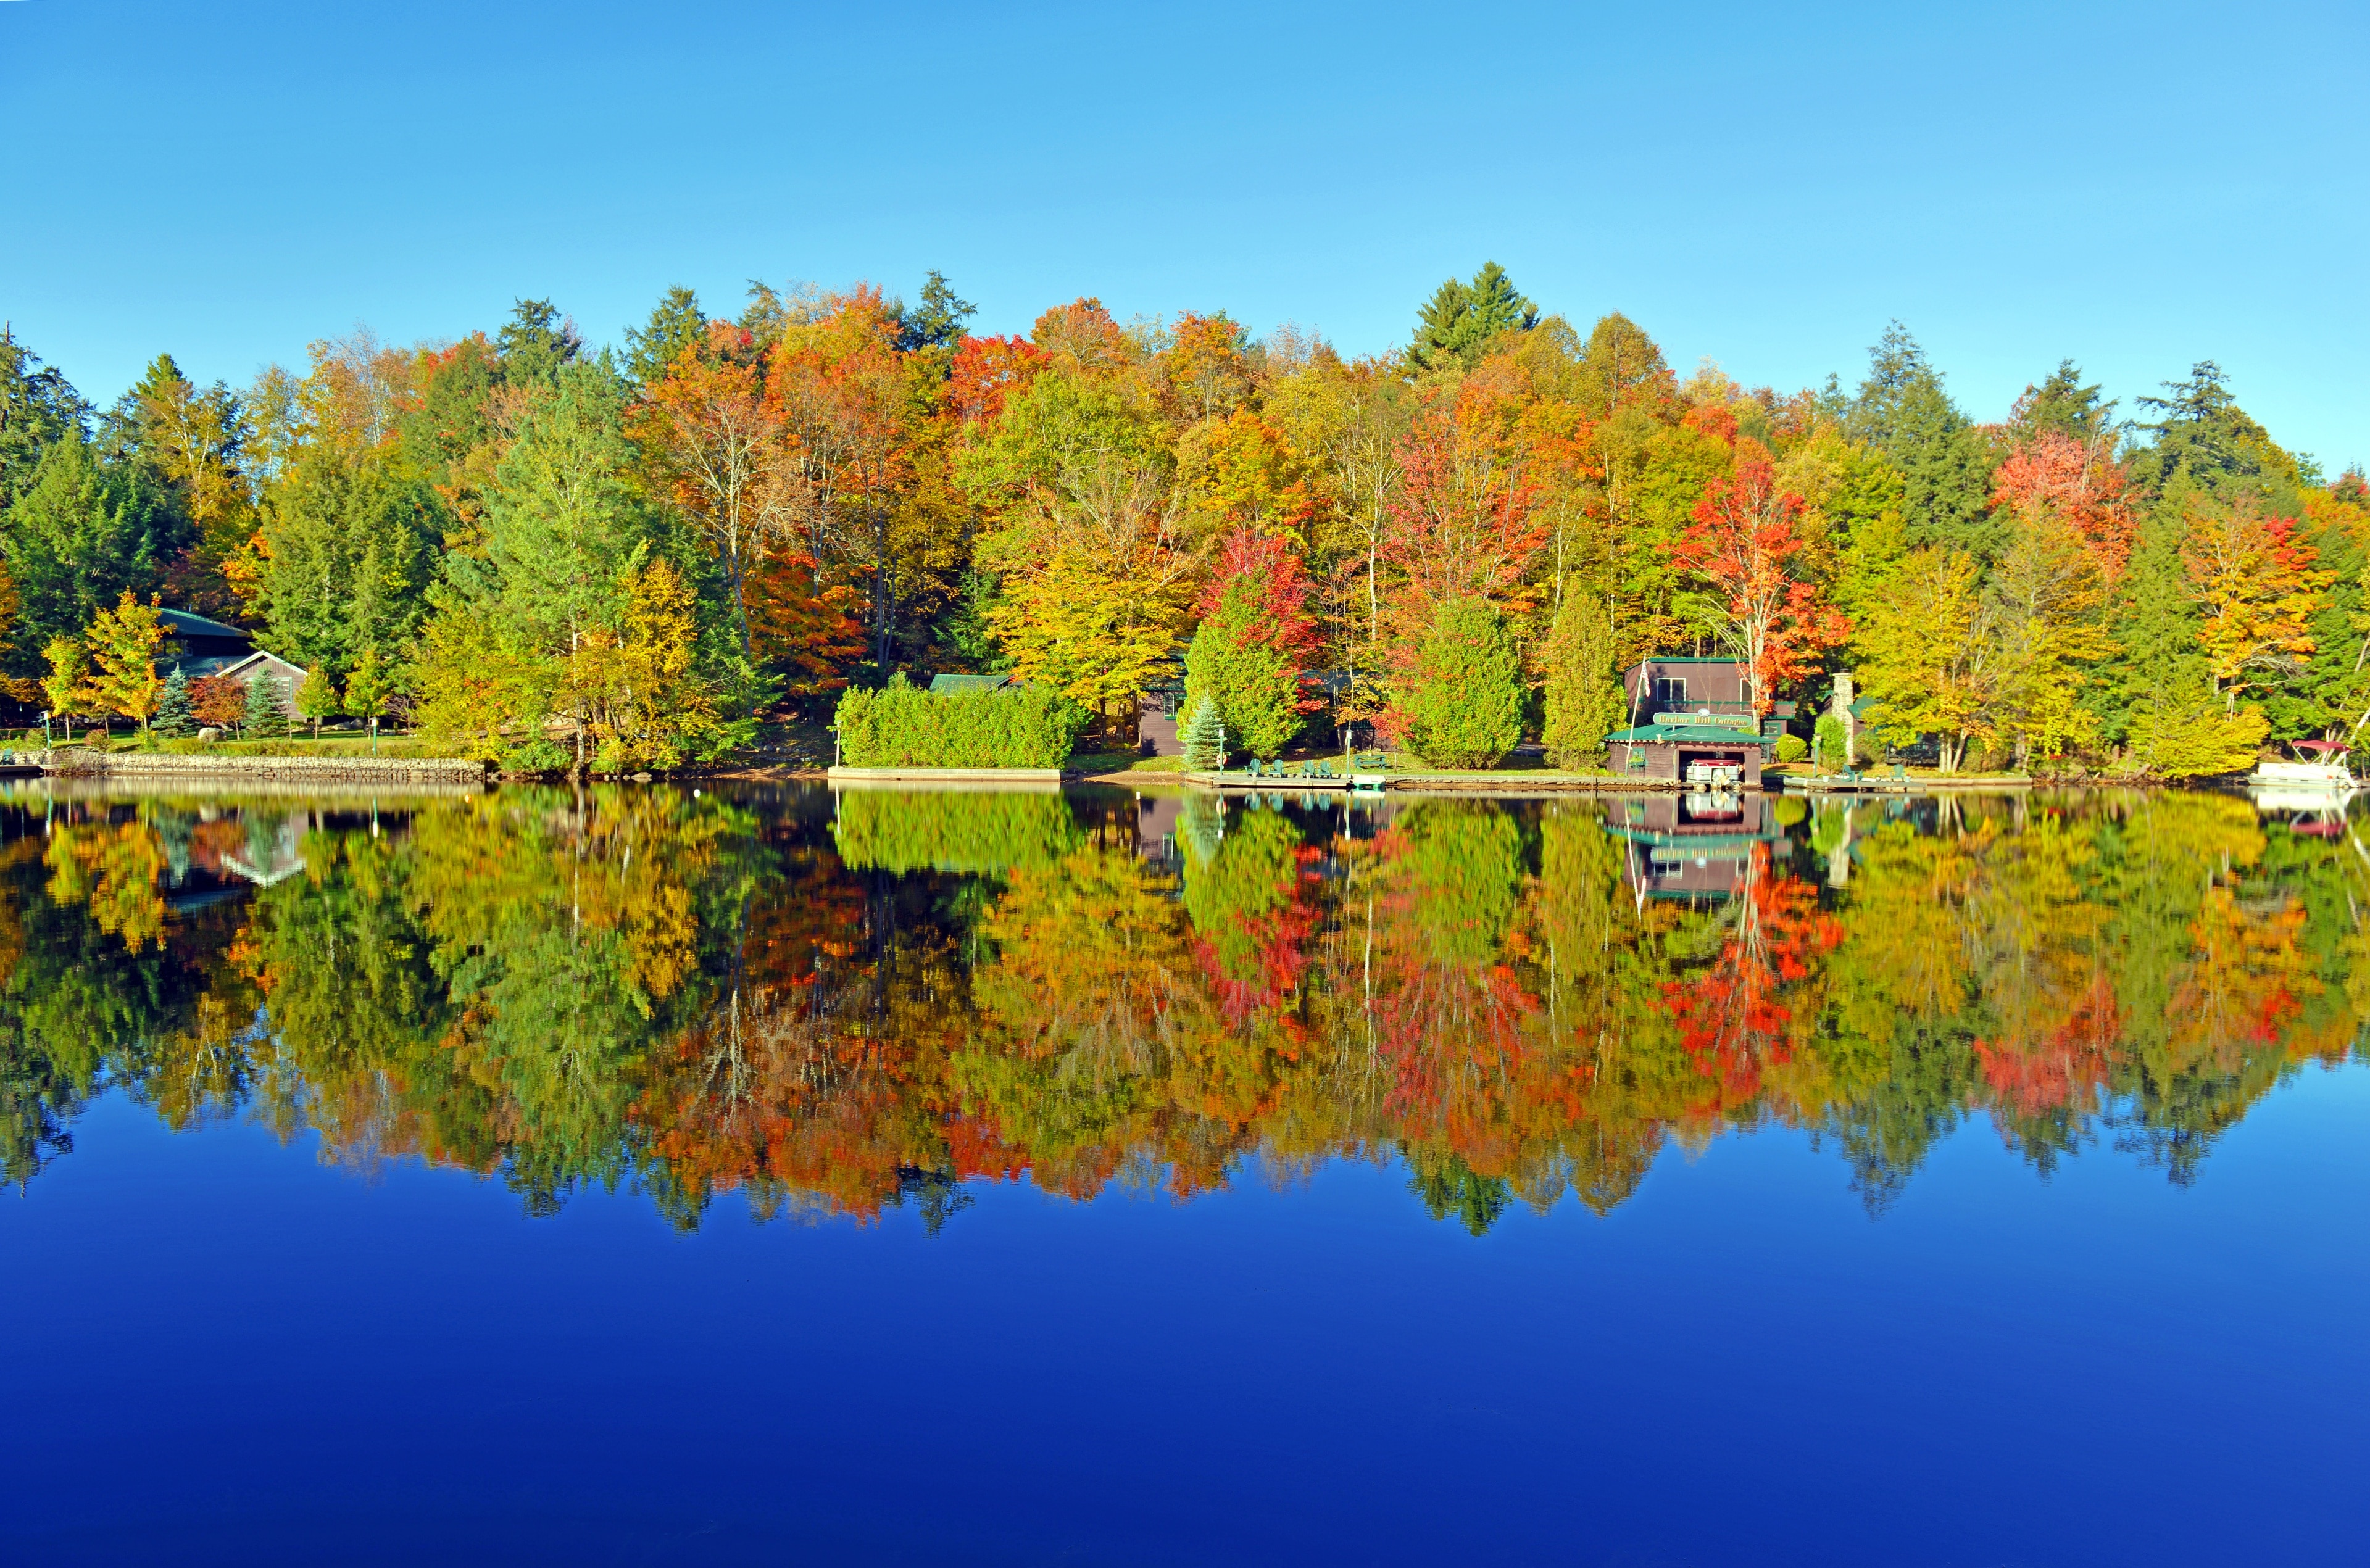 Schuyler County, New York, United States of America